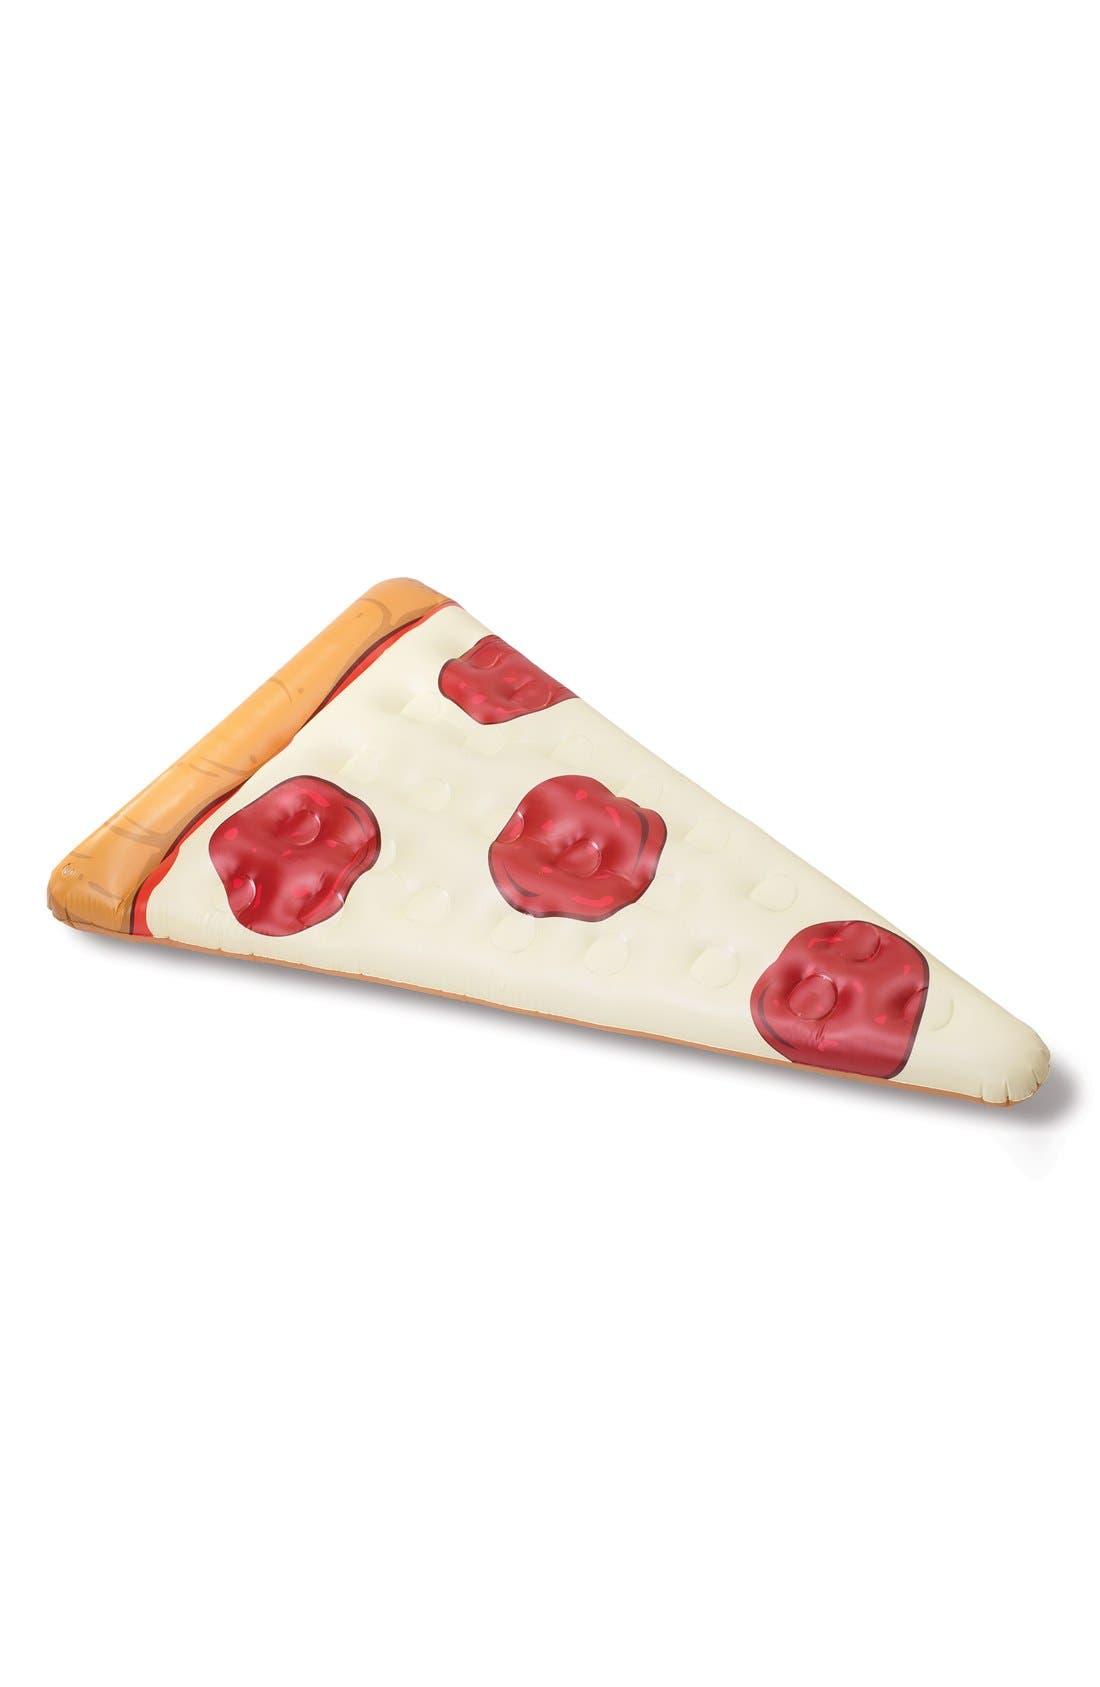 Main Image - BigMouth Inc. Giant Pizza Slice Pool Float